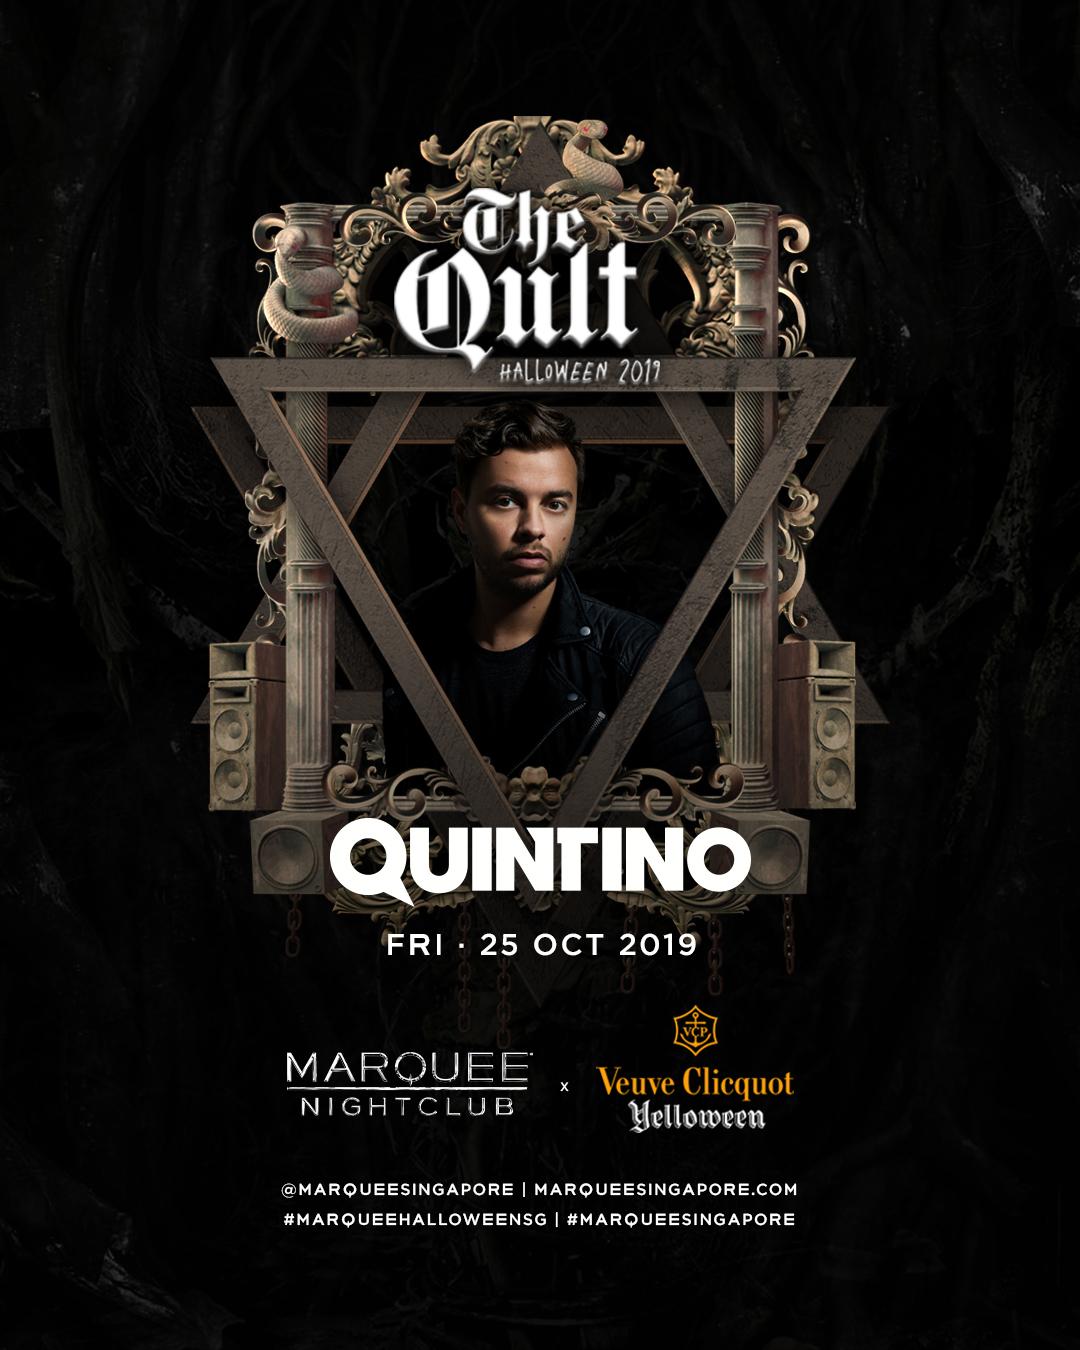 Halloween 2019 The Qult Yelloween Edition Presents